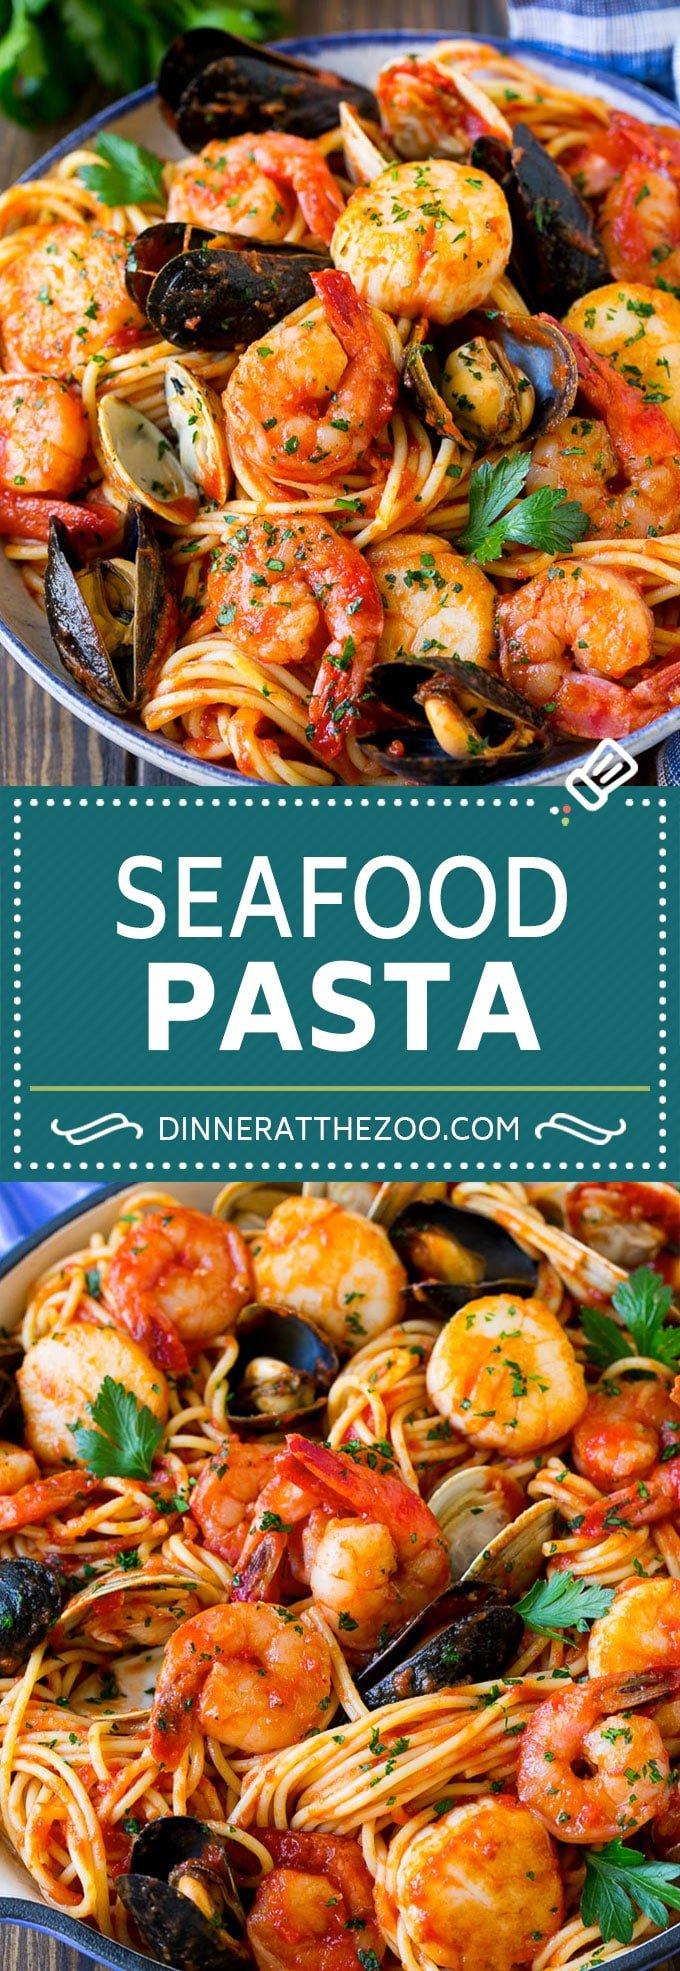 Seafood Pasta Recipe | Shrimp Pasta #pasta #spaghetti #shrimp #clams #scallops #dinner #dinneratthezoo